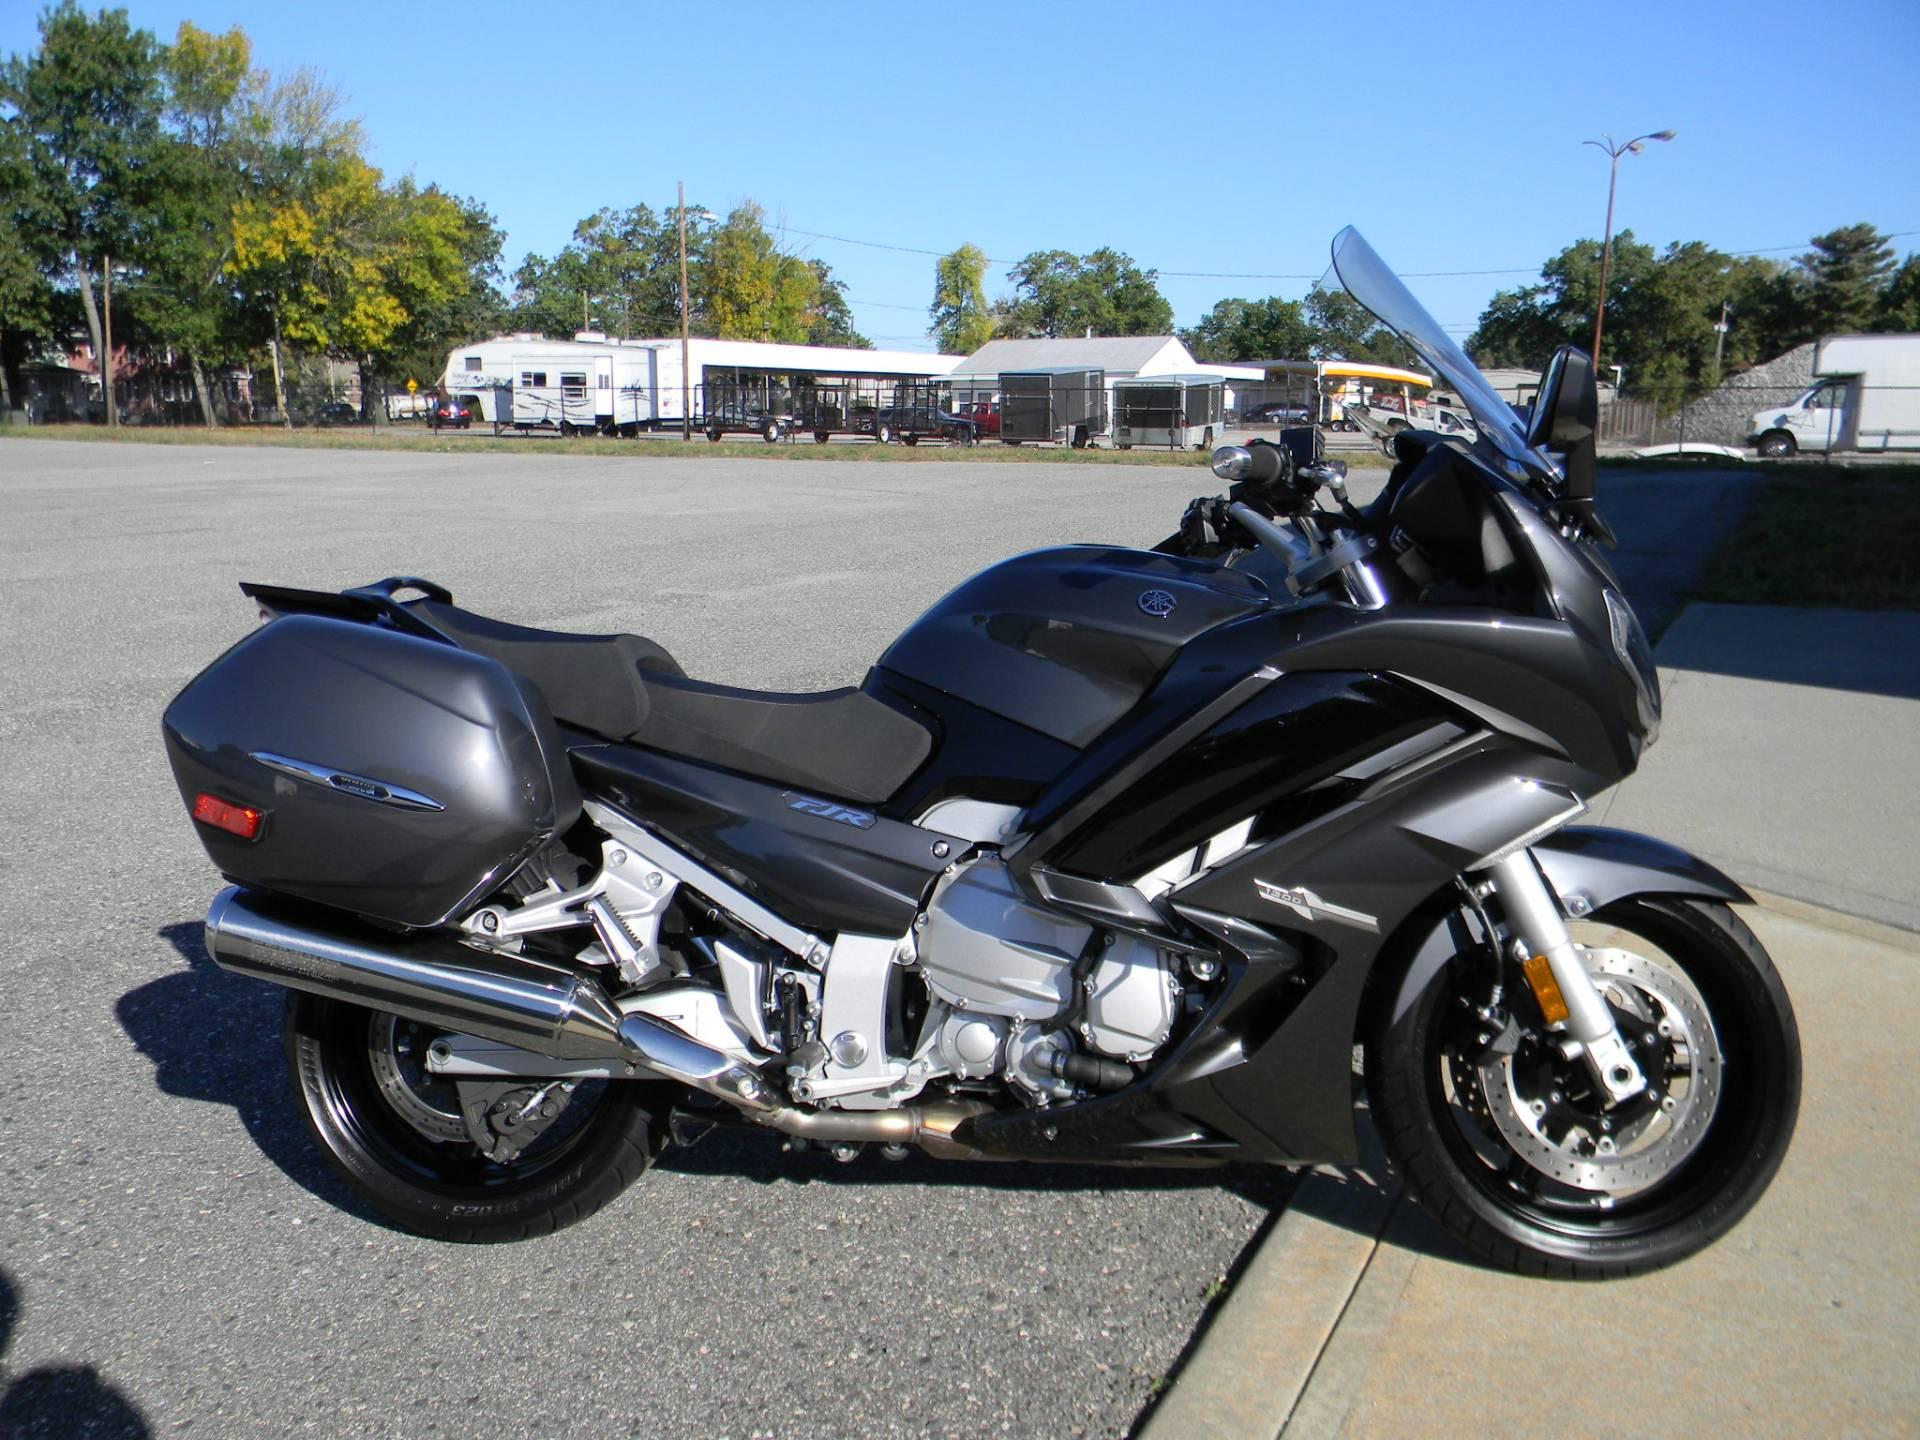 2015 Yamaha FJR1300A 1